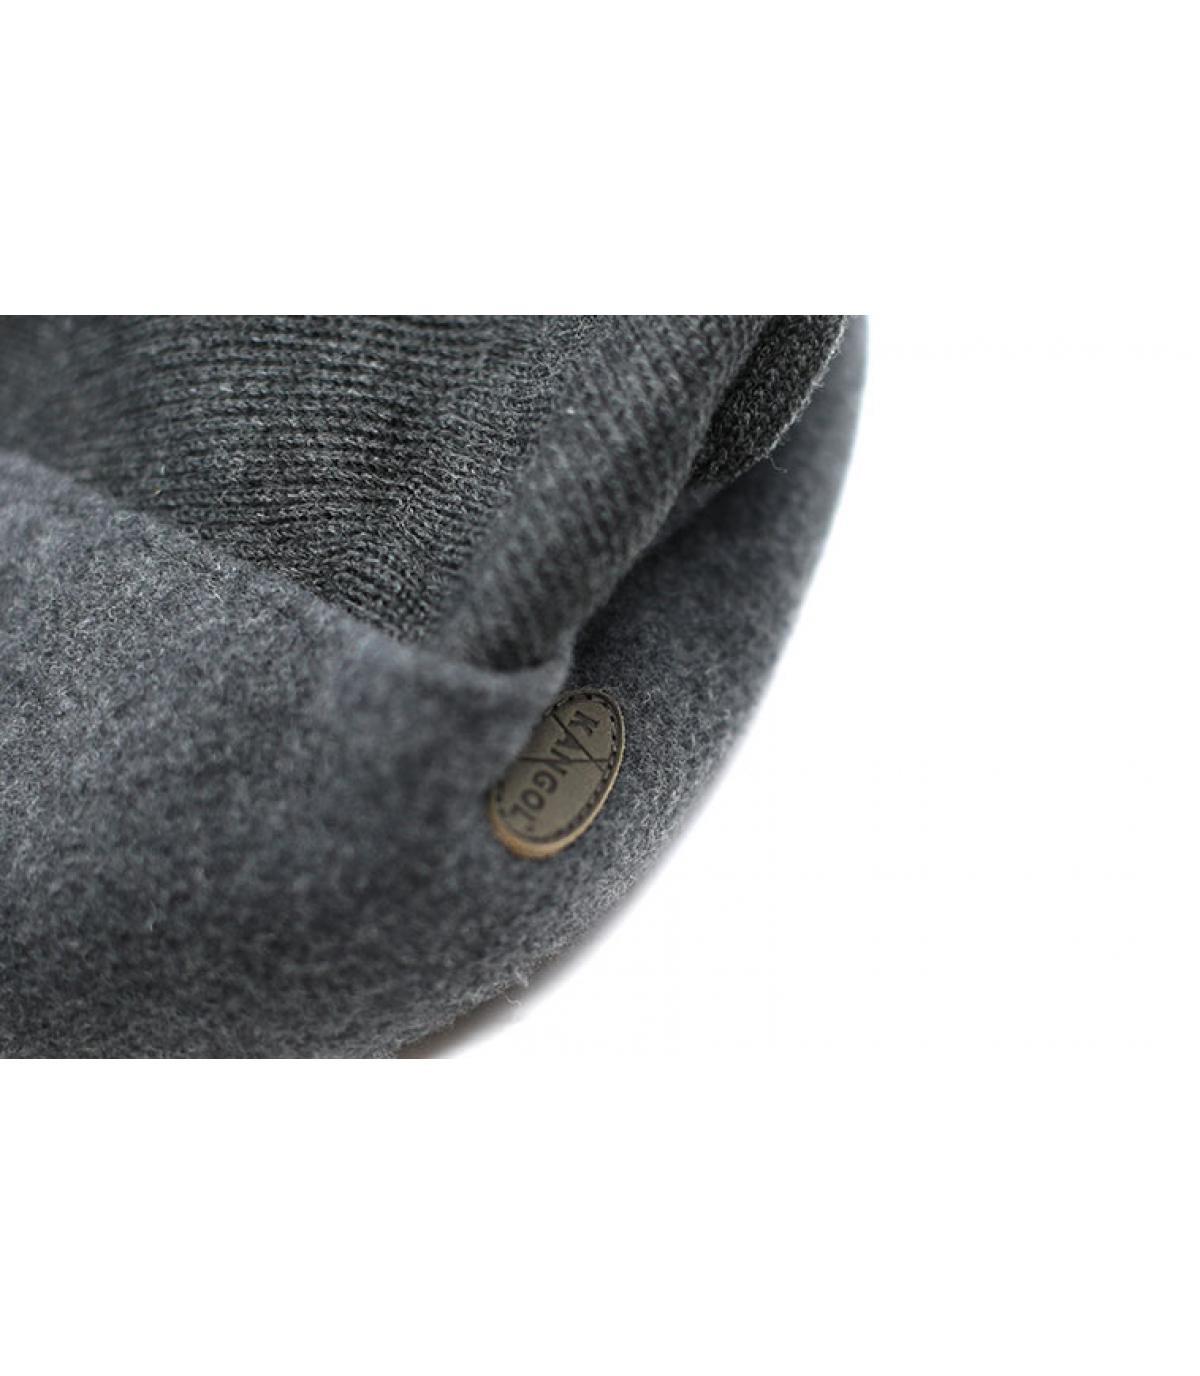 Details Wool 504 Earflap dk flannel - afbeeling 3